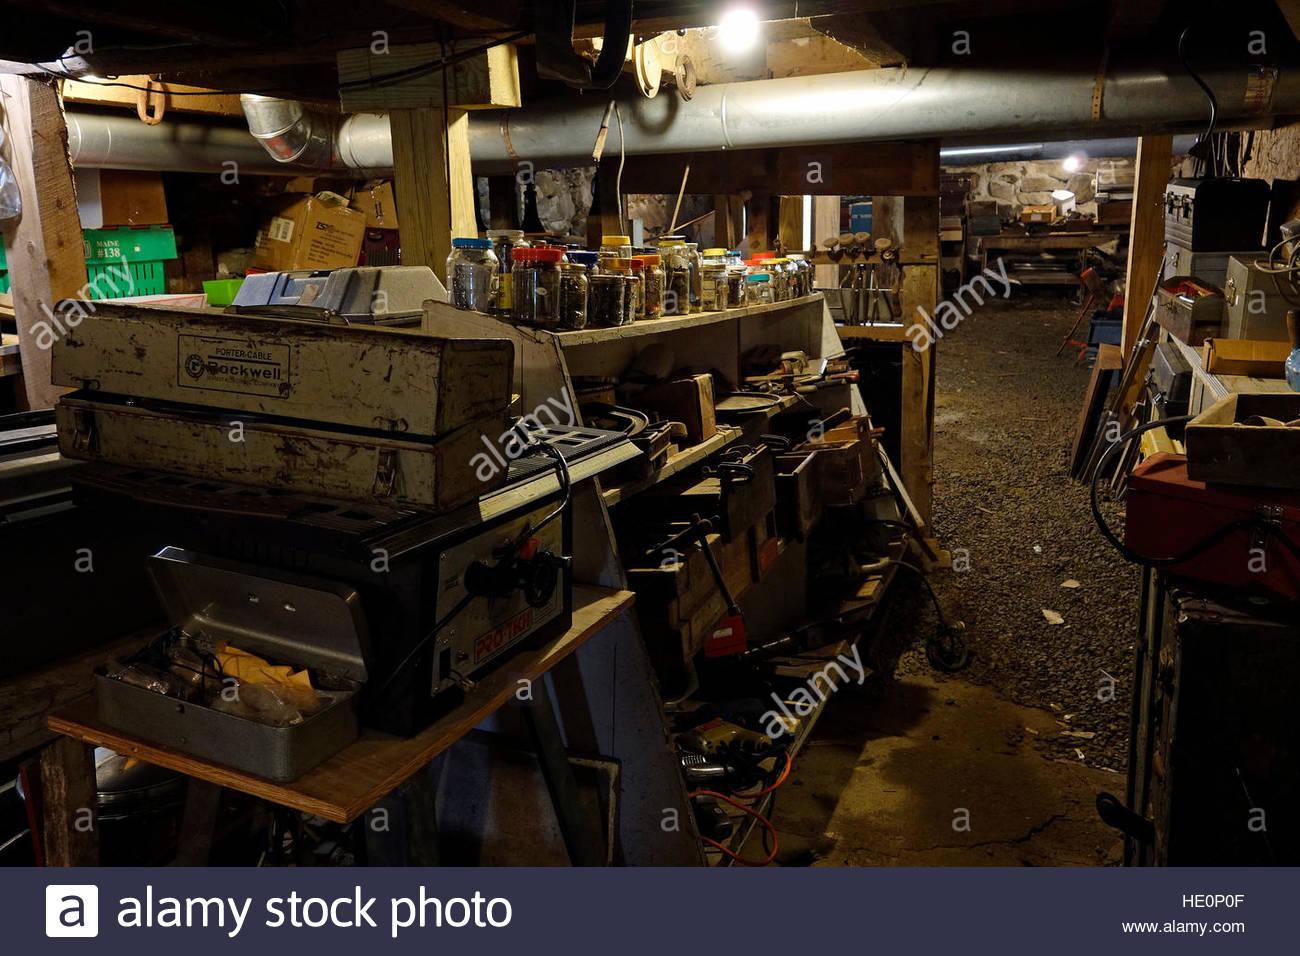 Basement of Liberty Tool Company, Maine, USA. - Stock Image